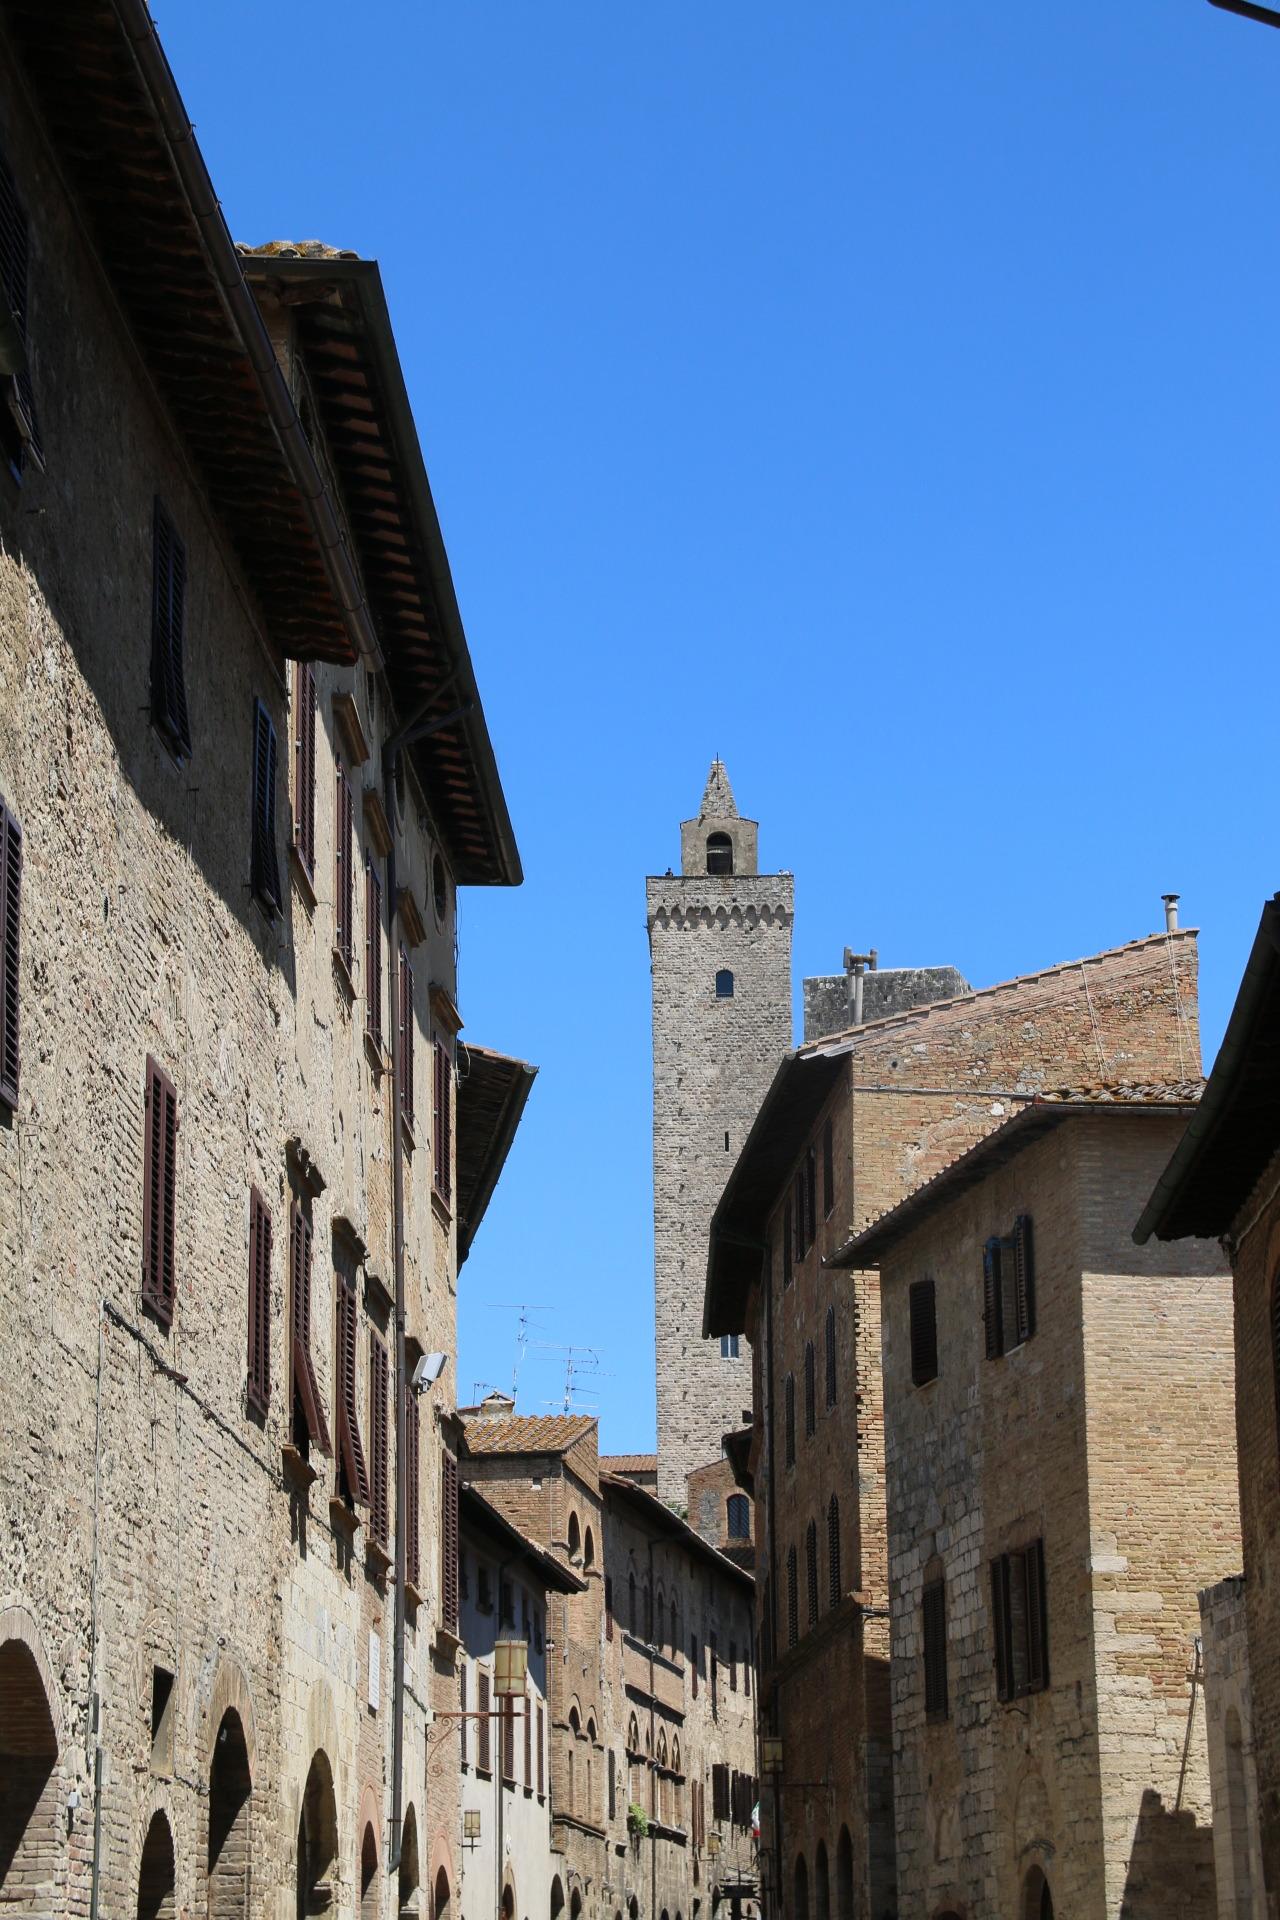 SAN GIMIGNANO - Gelato and medieval architecture